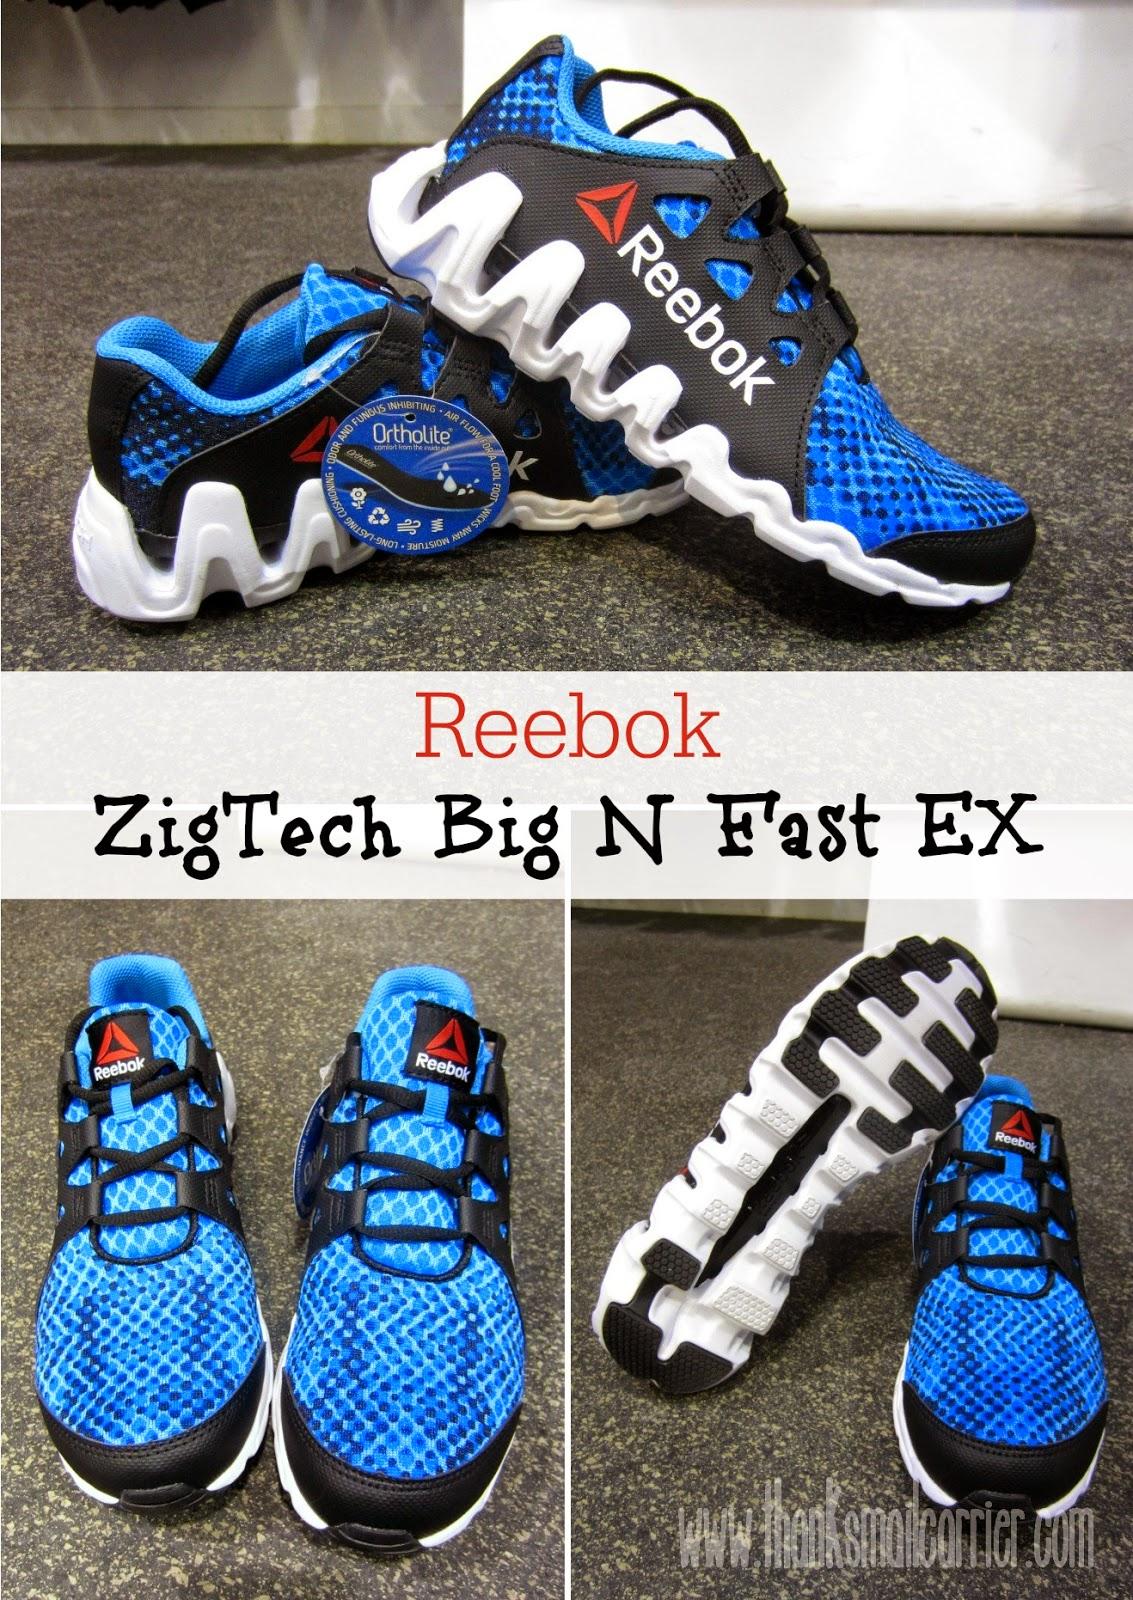 Reebok ZigTech Big N Fast EX